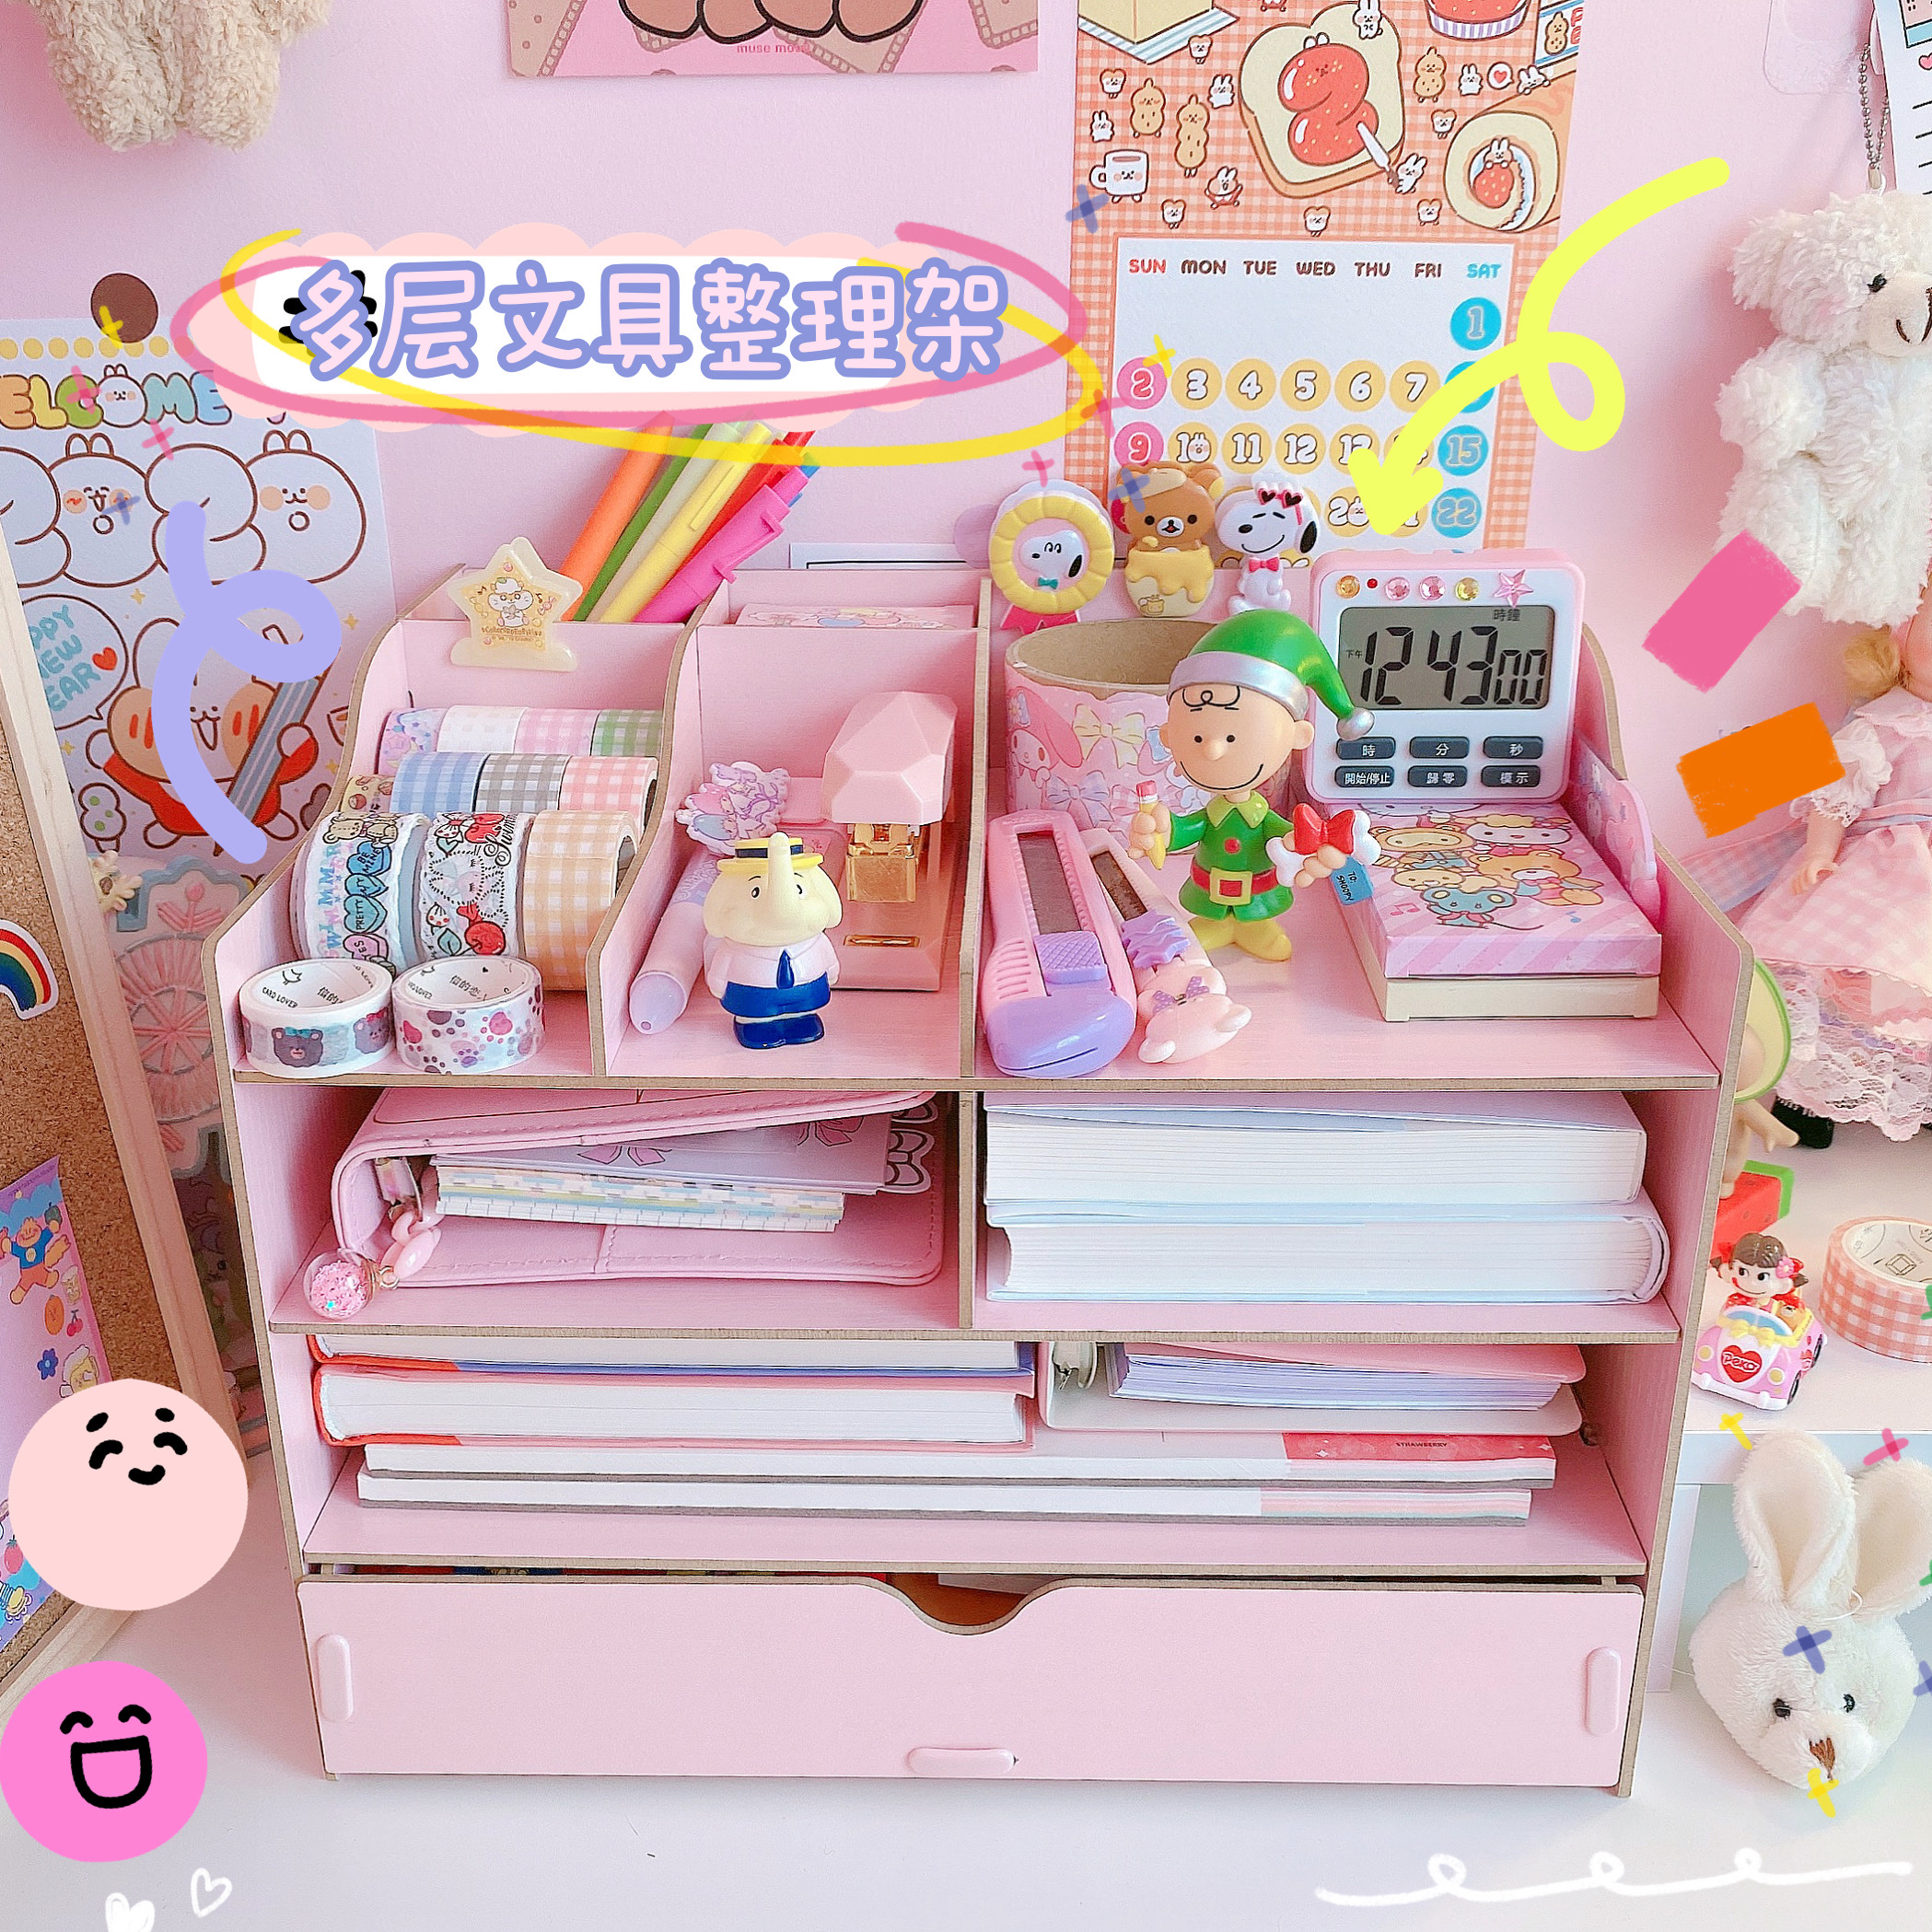 Wooden Cosmetic Makeup Organizer Book Holder Desk Stationery Storage Washi Tapes Collection Shelf Rack Dolls Display